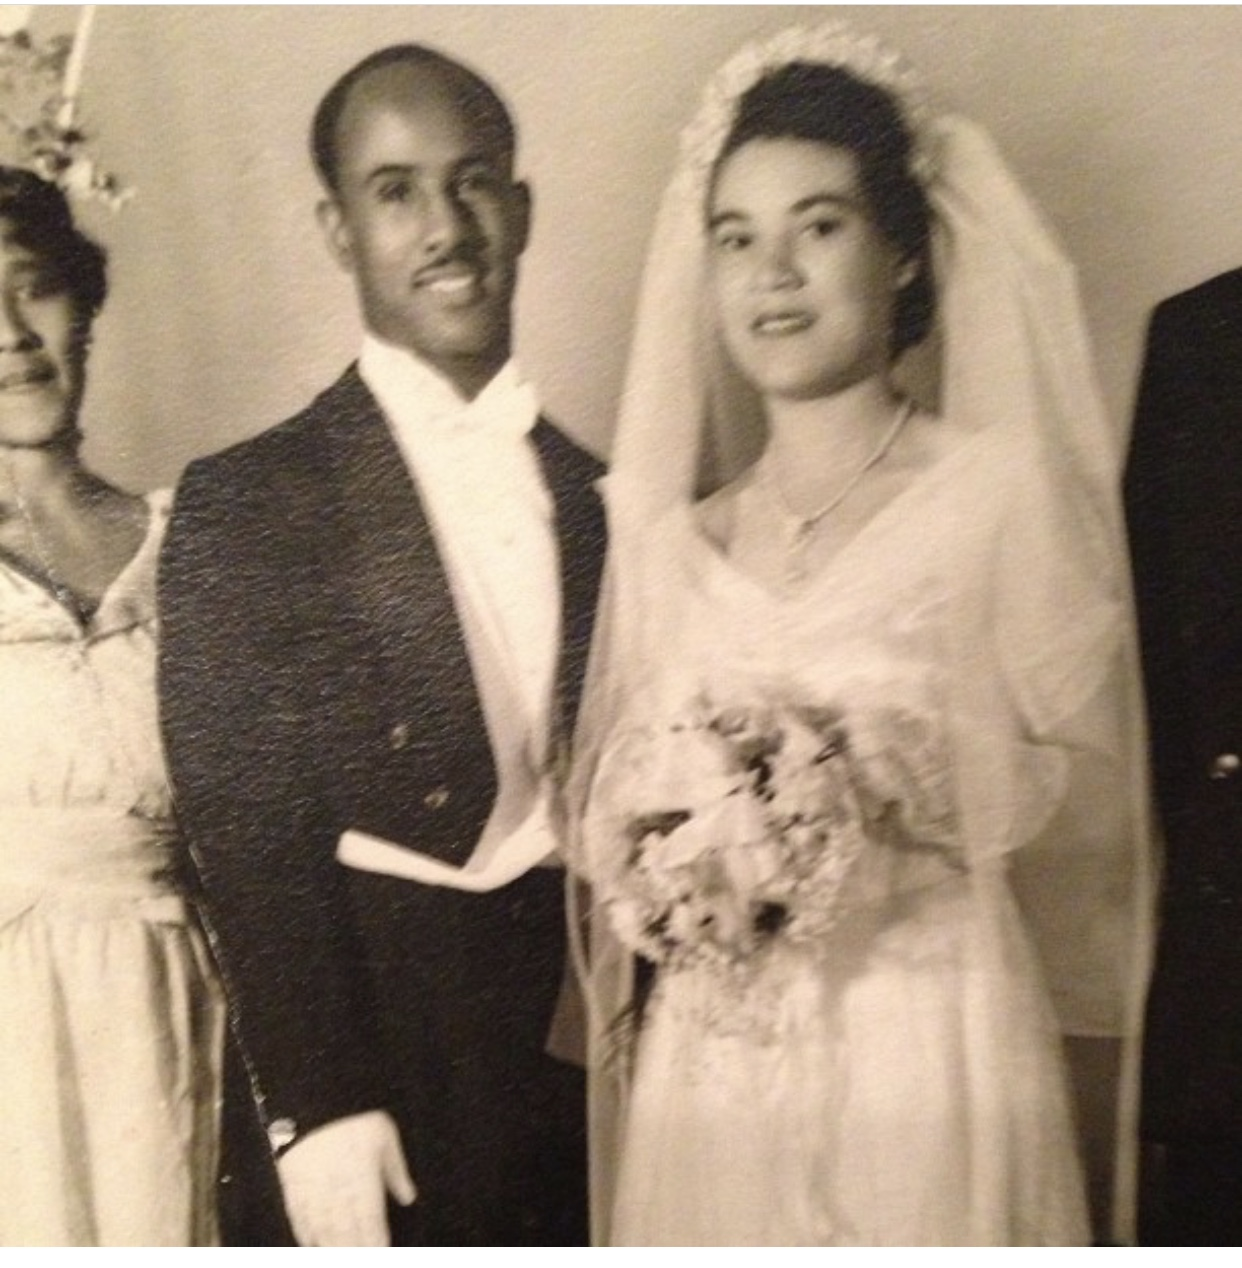 My grandpa and Grandma